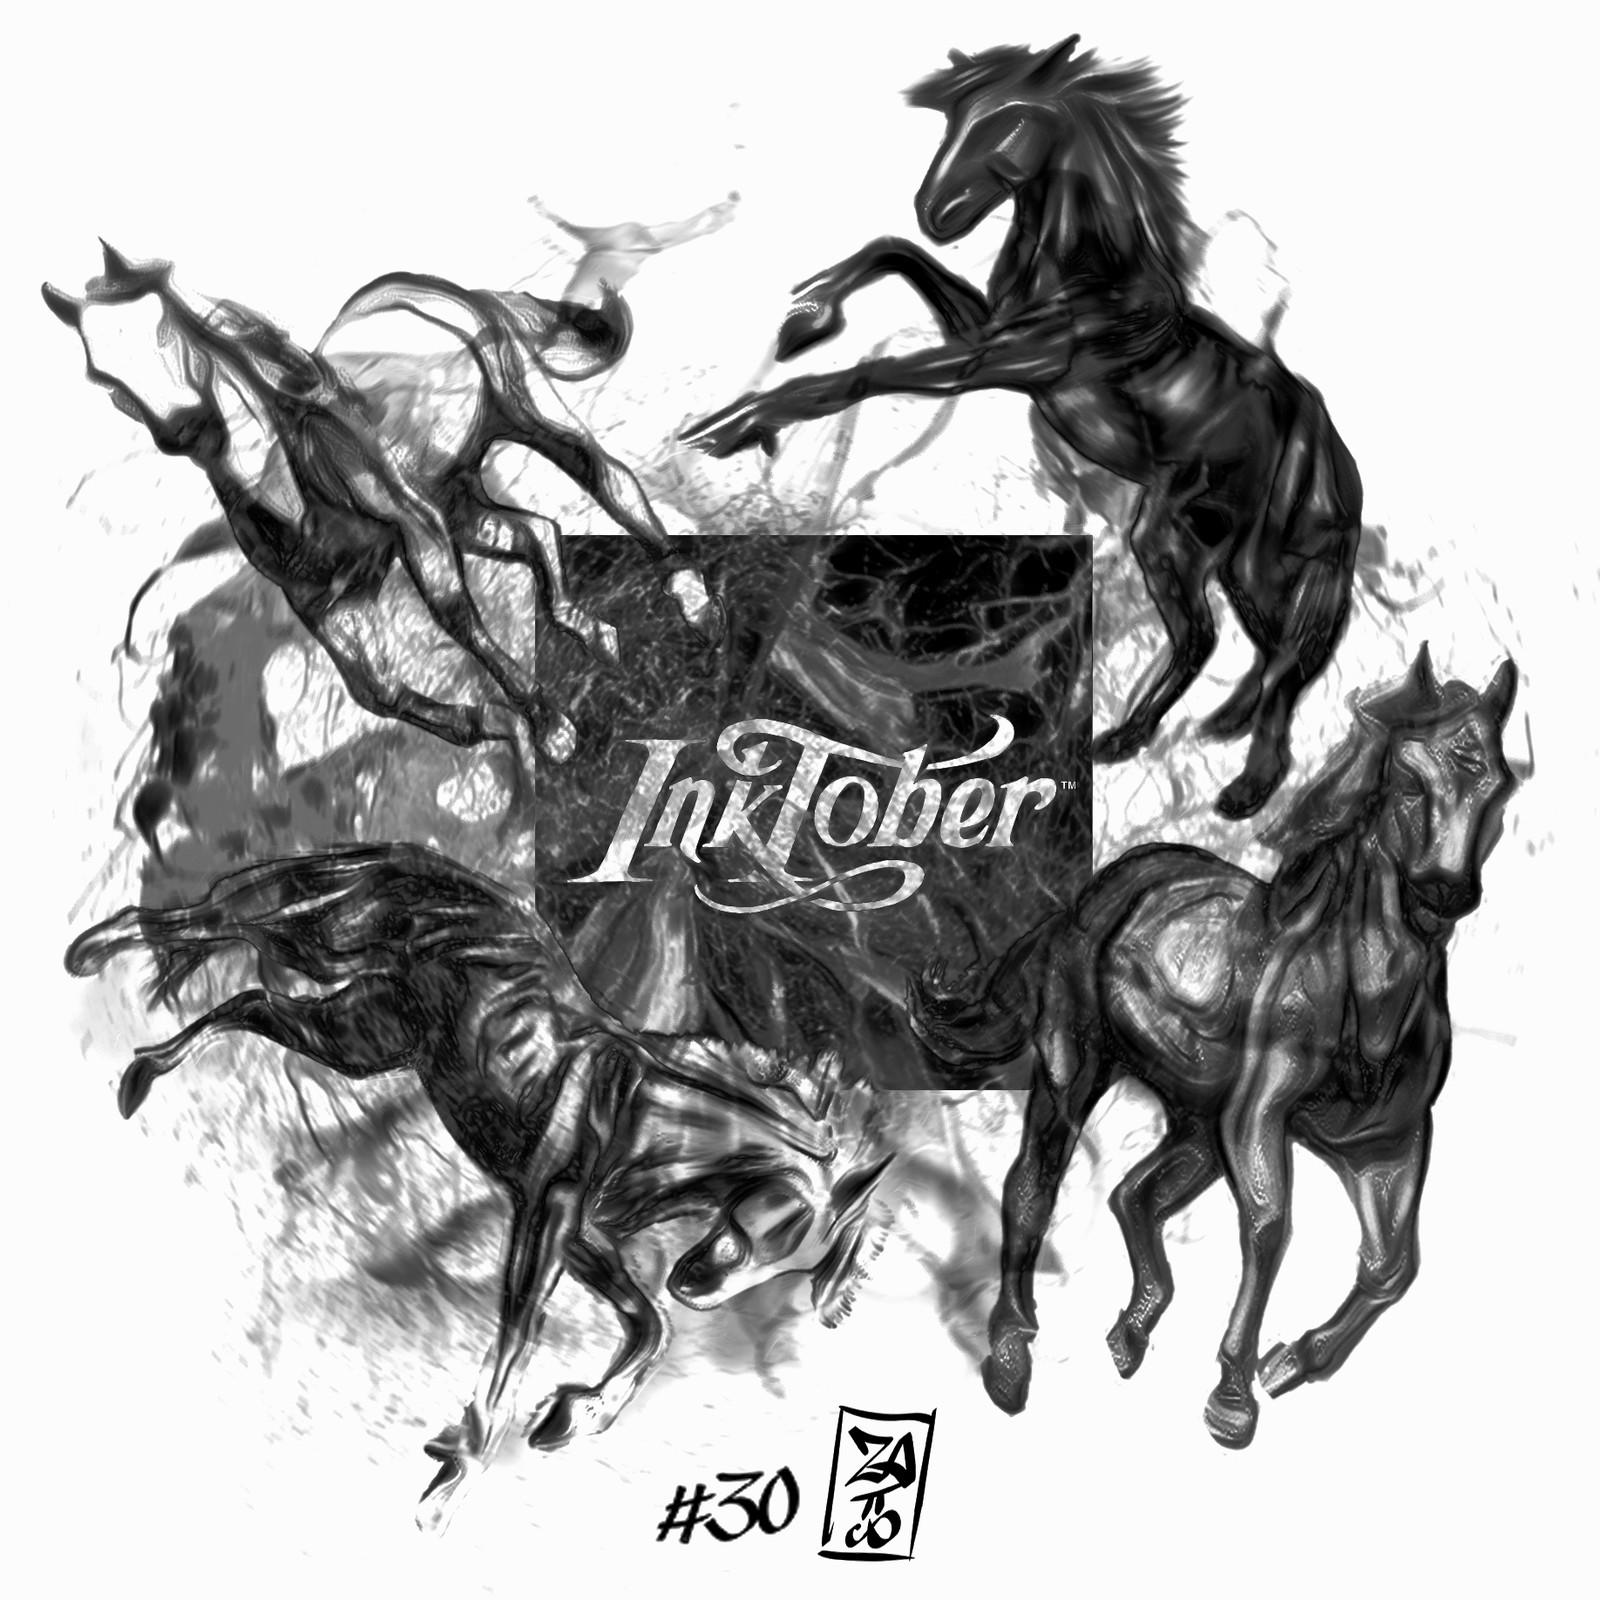 inktober #30